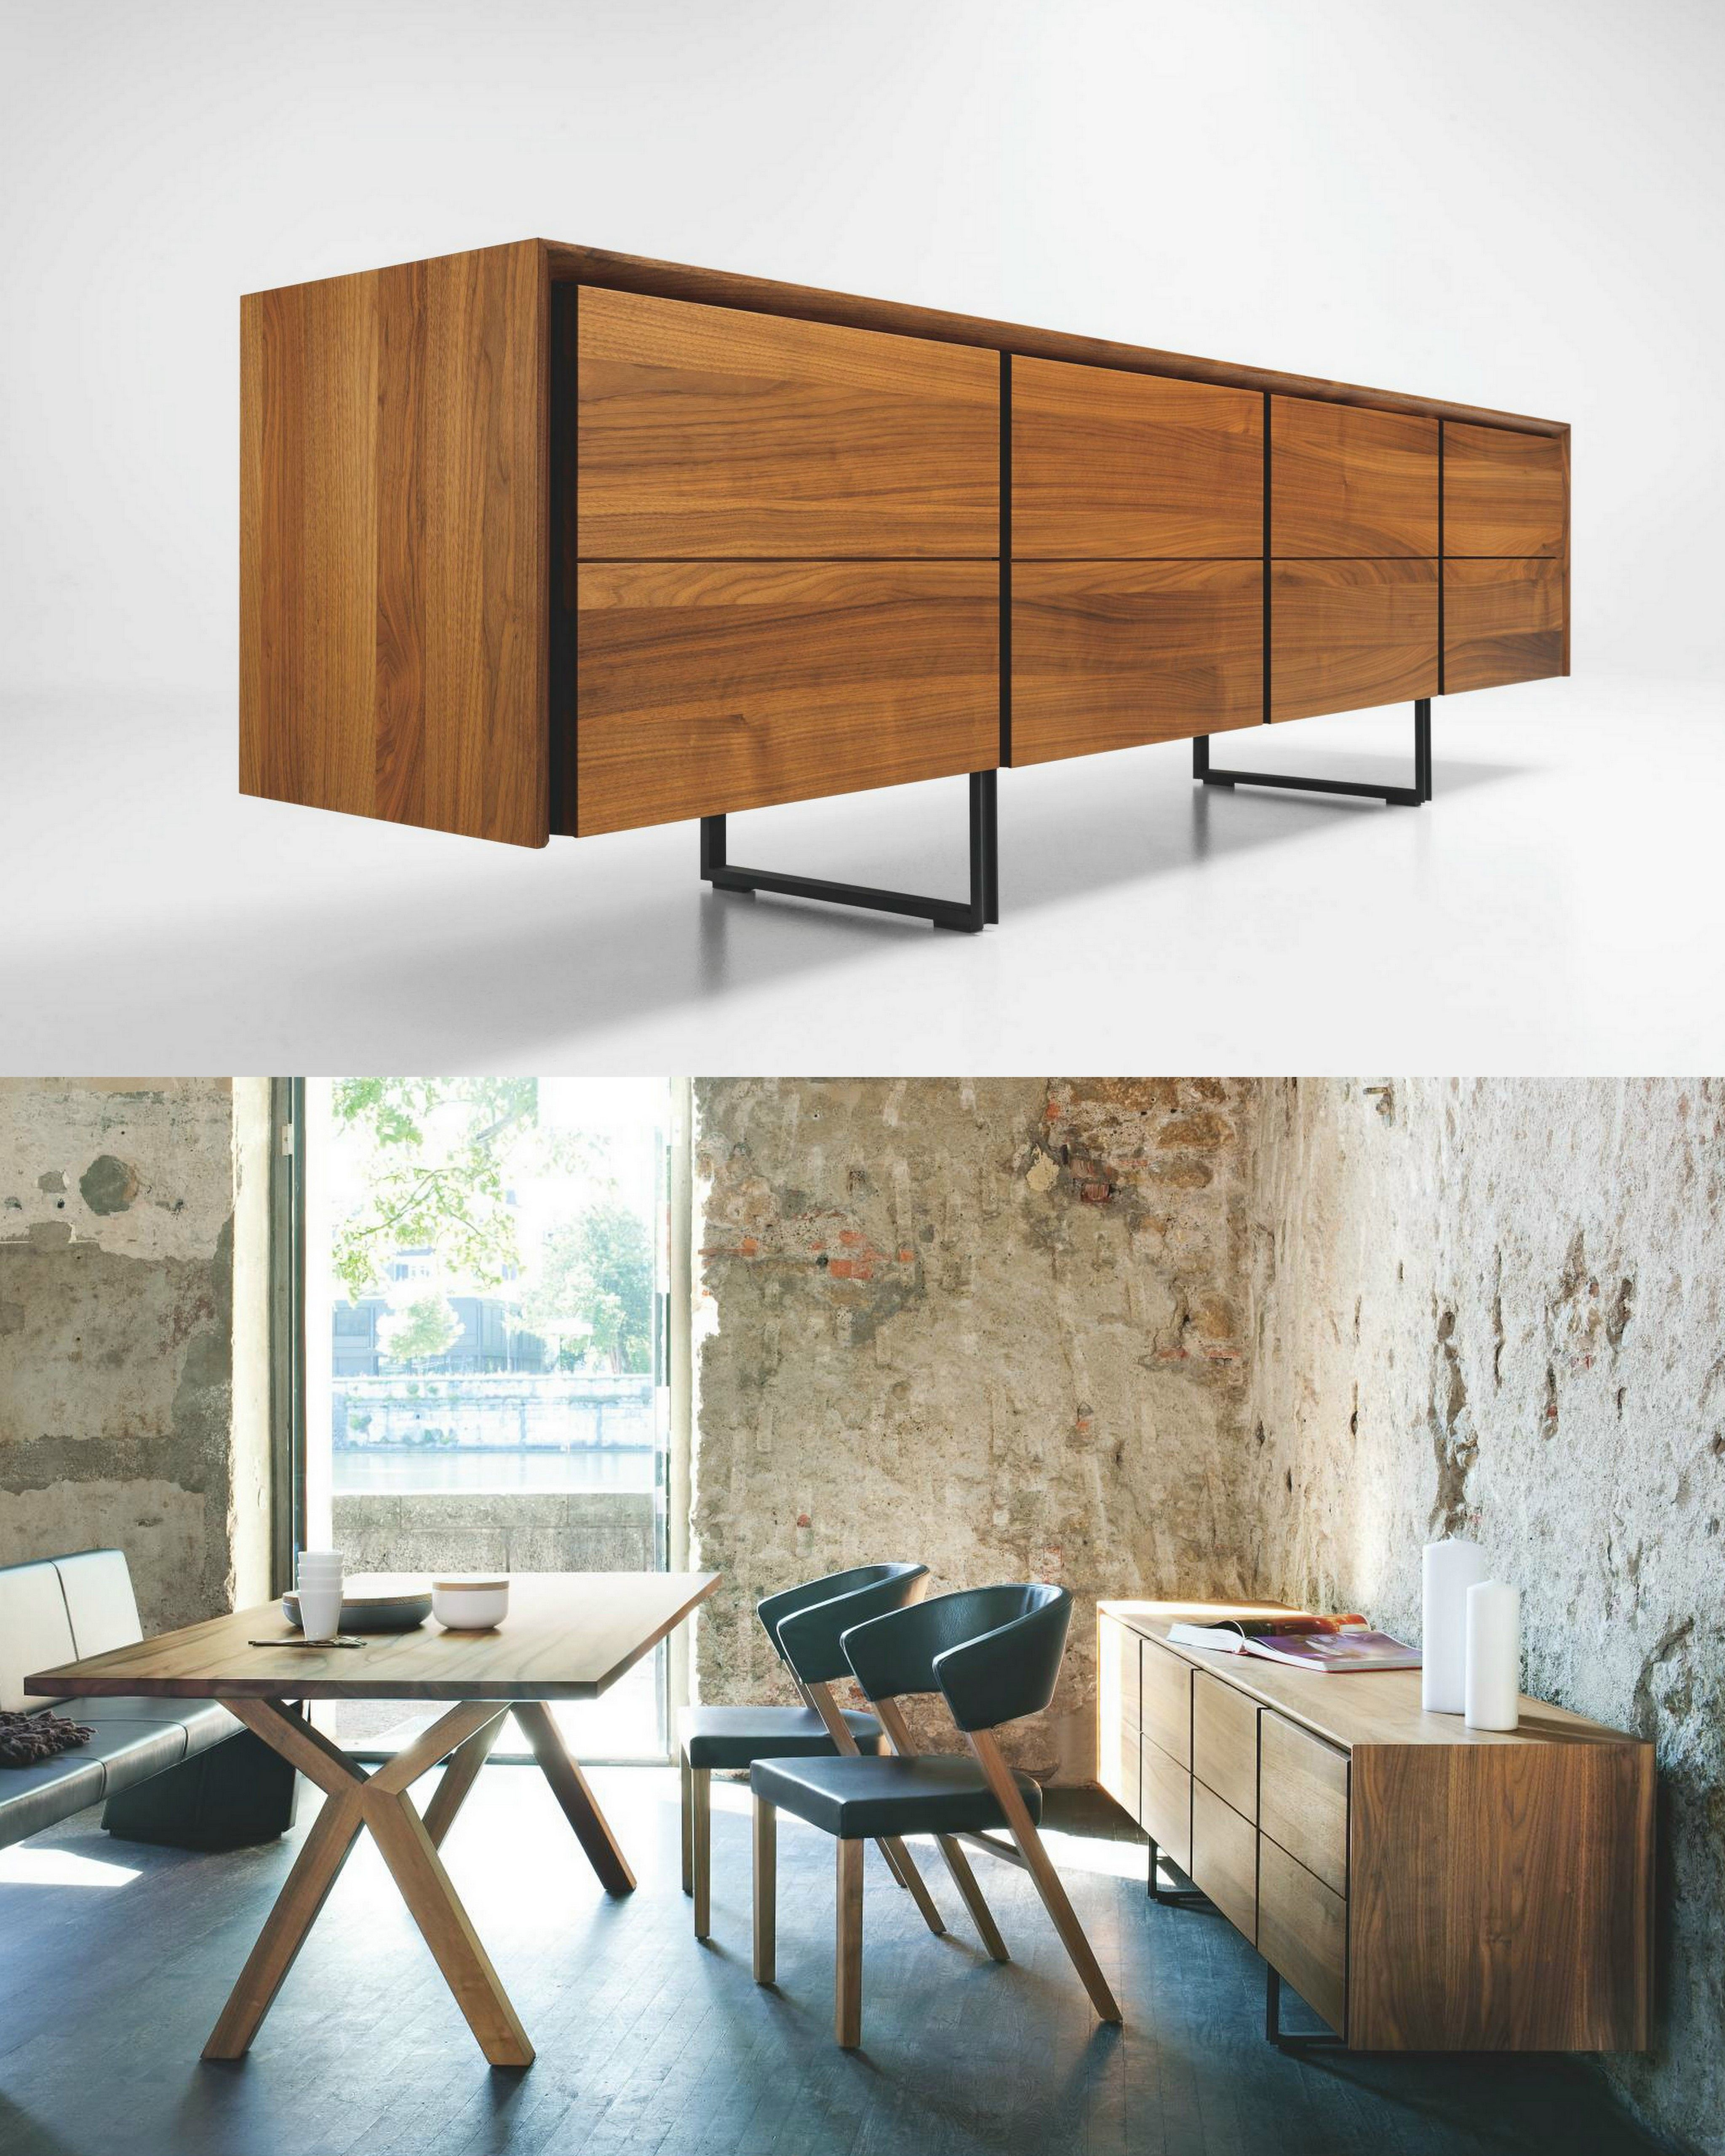 Sideboard with drawers enna by girsberger design for Mobilya design